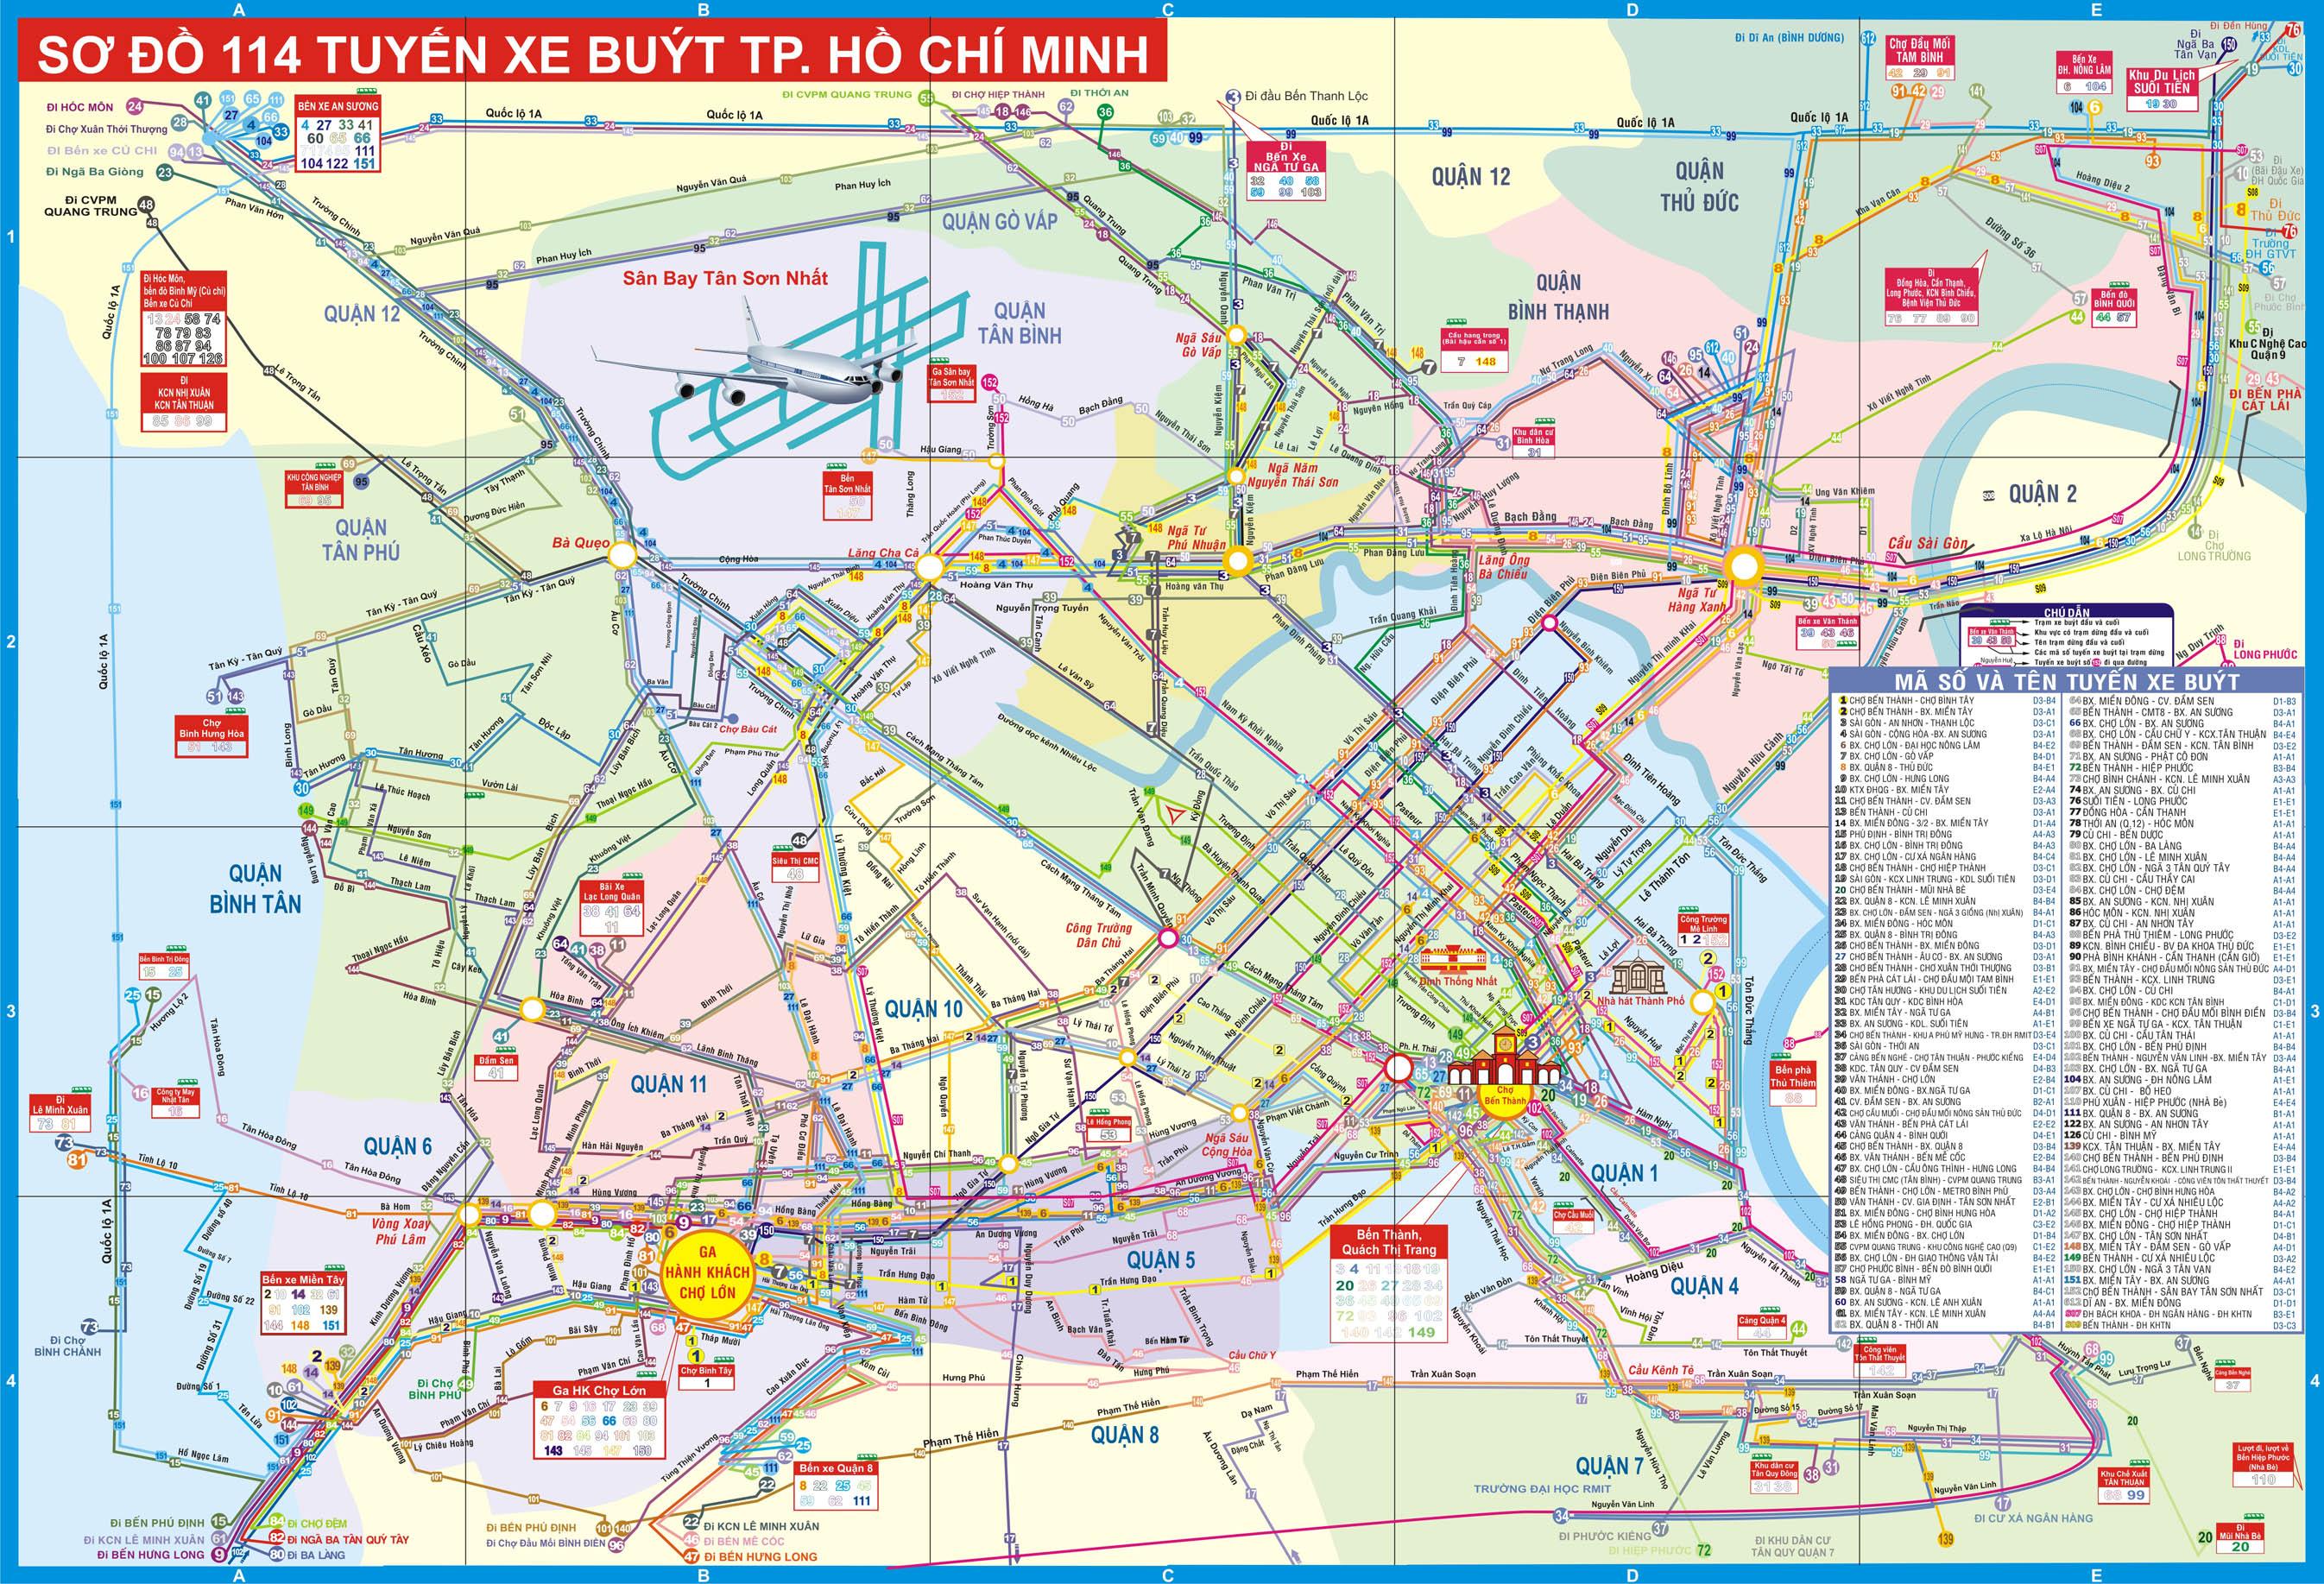 Ho Chi Minh Tourist Map Ho Chi Minh Mappery